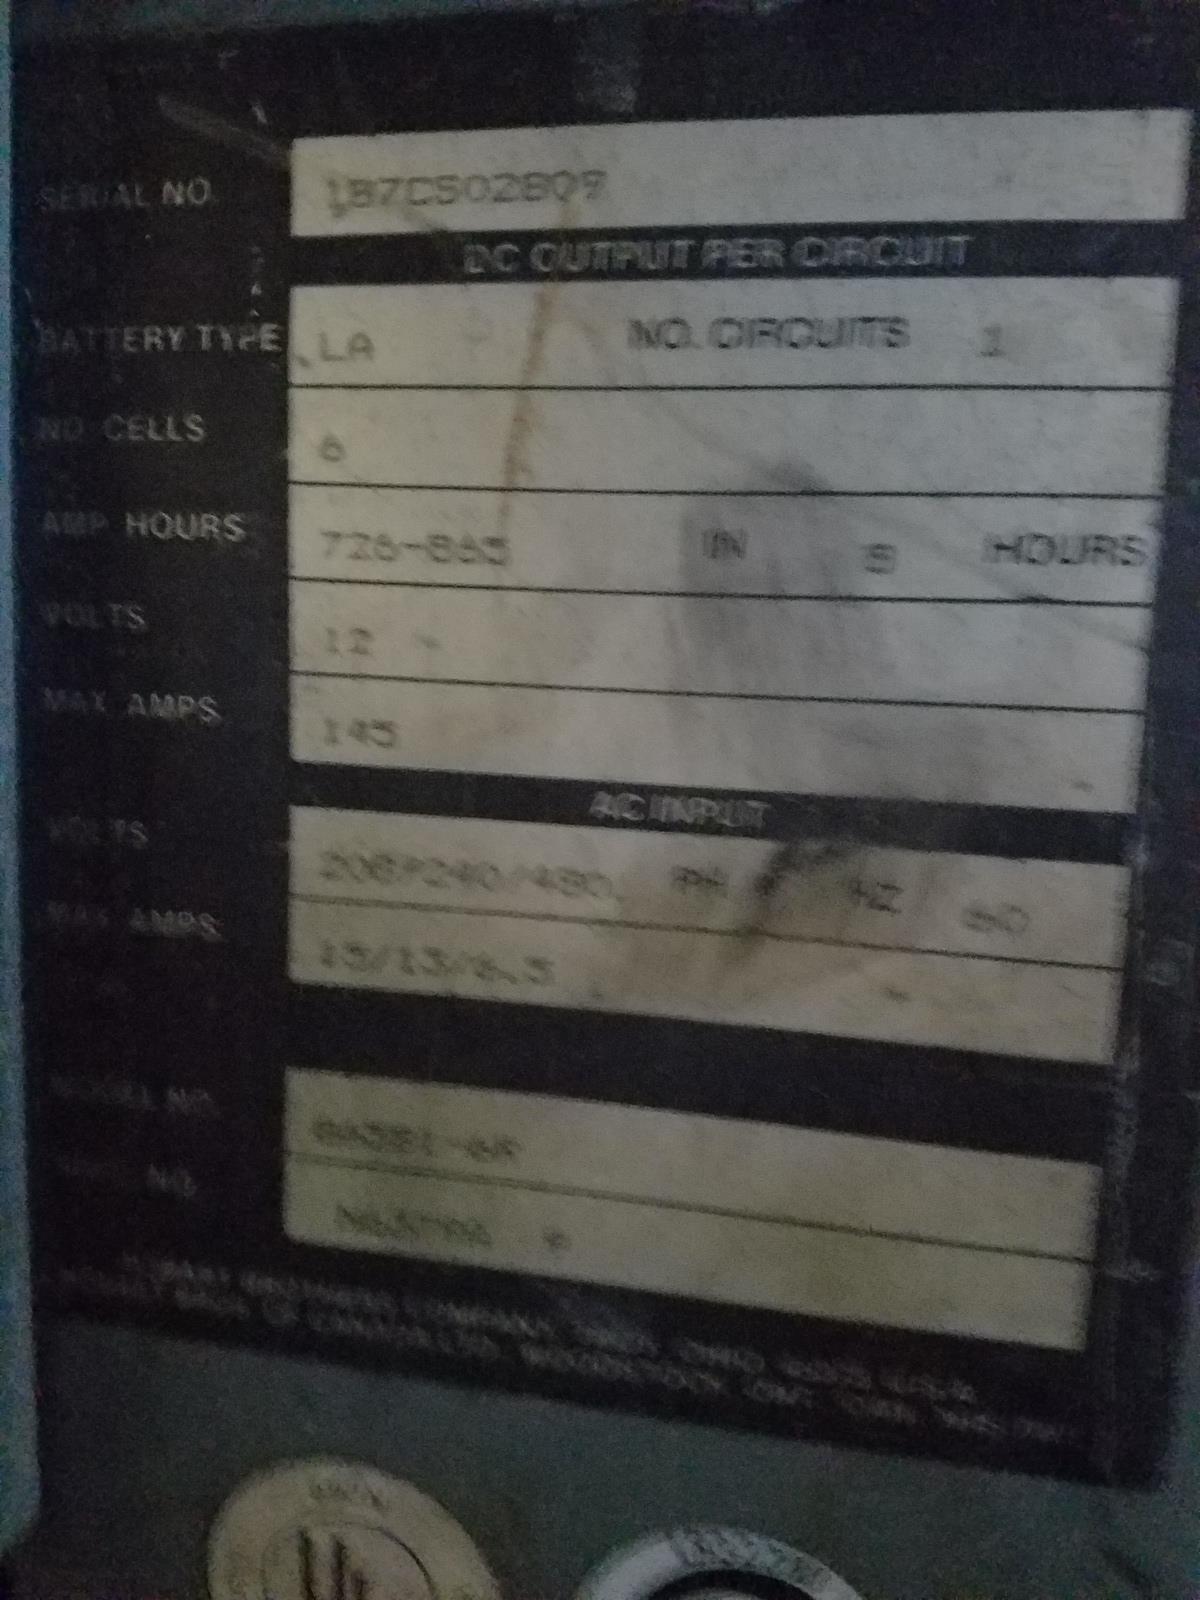 Hobart Battery Charger,12 Volt, S/N 1B7C502809   Rig Fee: $25 - Image 2 of 2